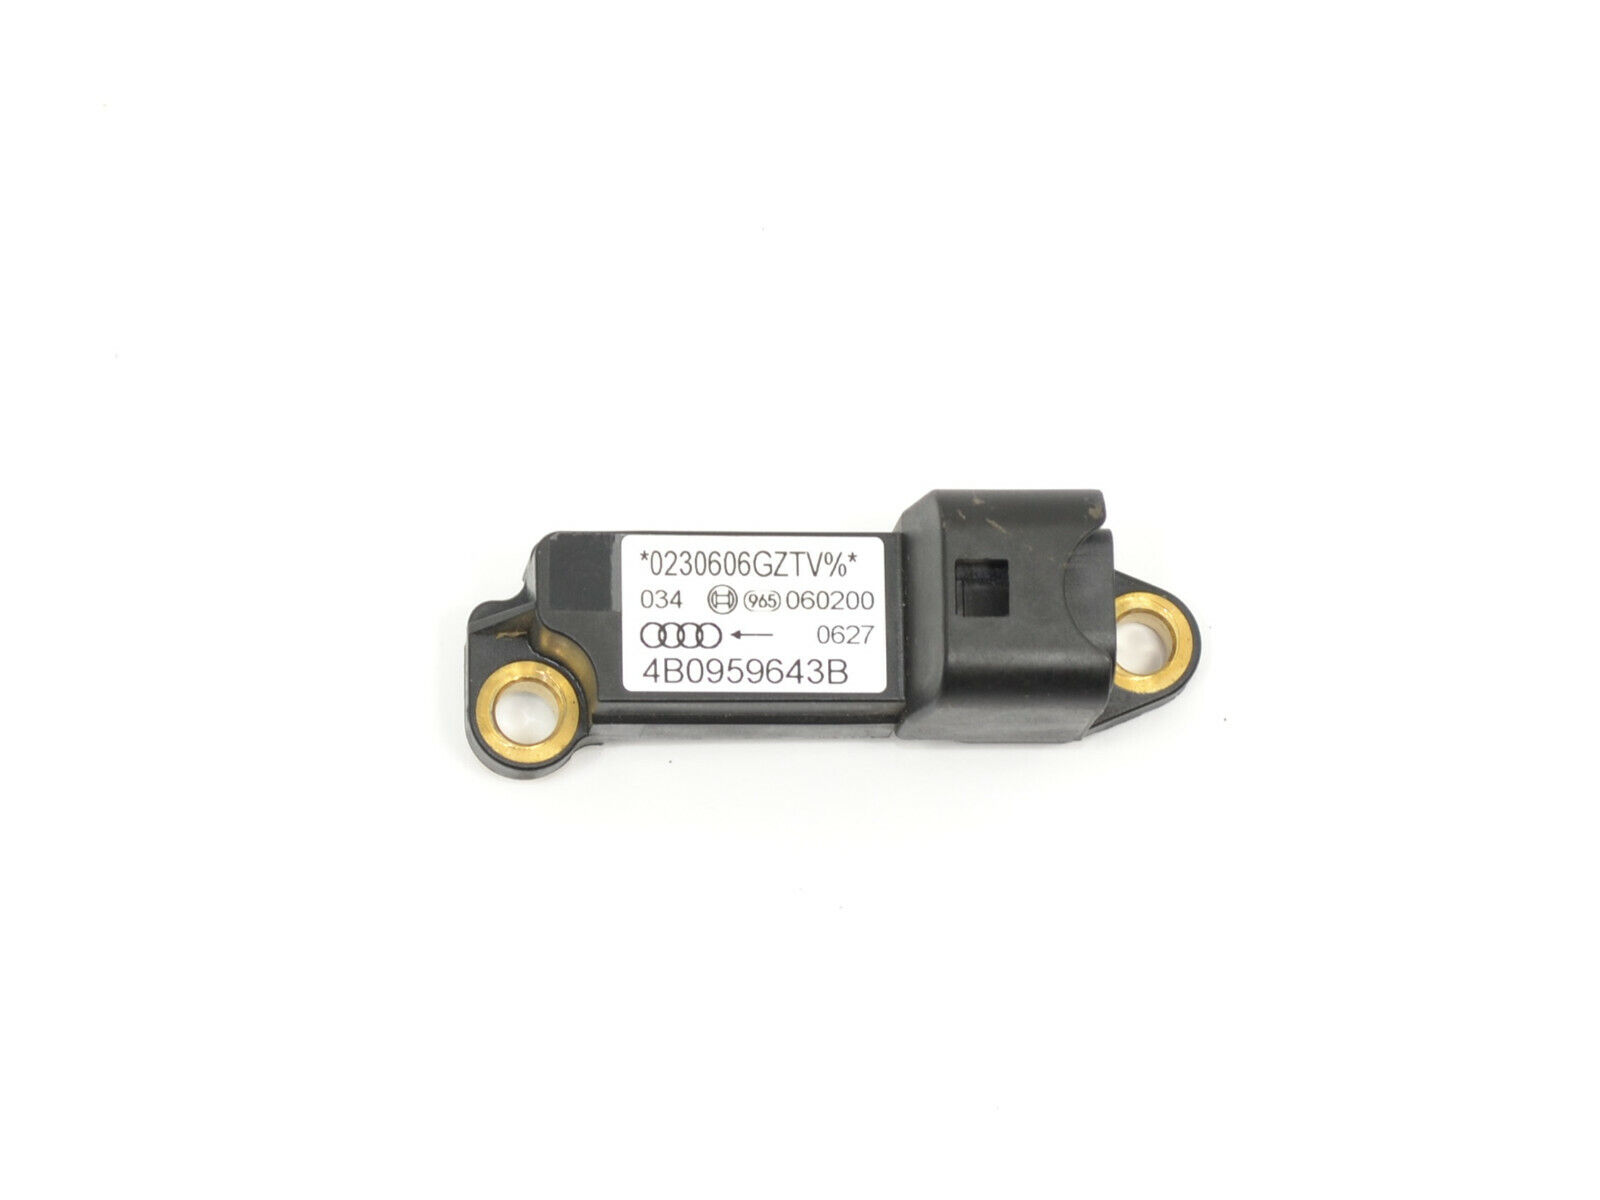 AIRBAG CRASH Sensor Audi A6 4B 4B0959643B Querbeschleunigungssensor